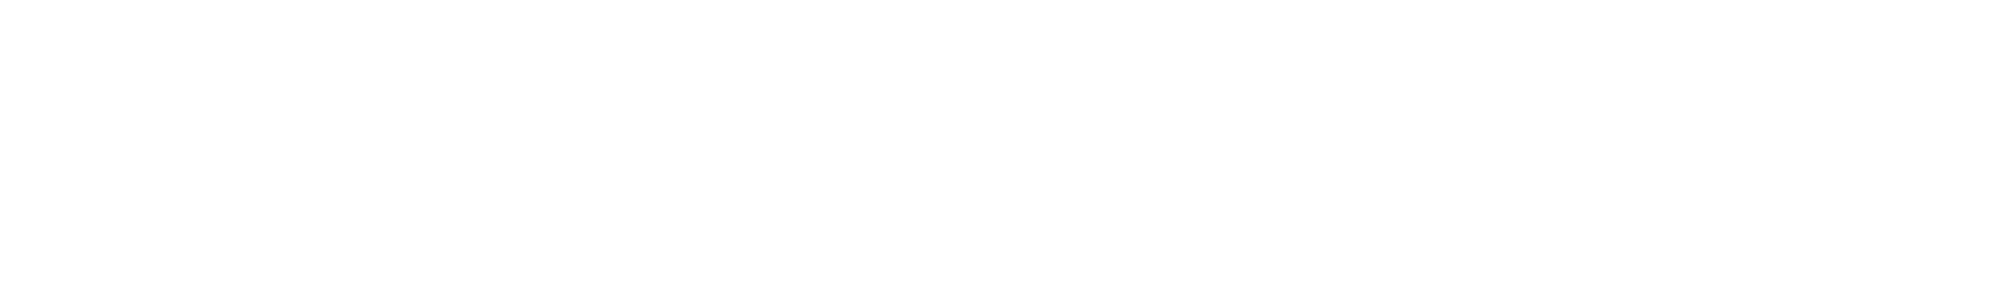 Holmen_Logo_Blue_CMYK.psd